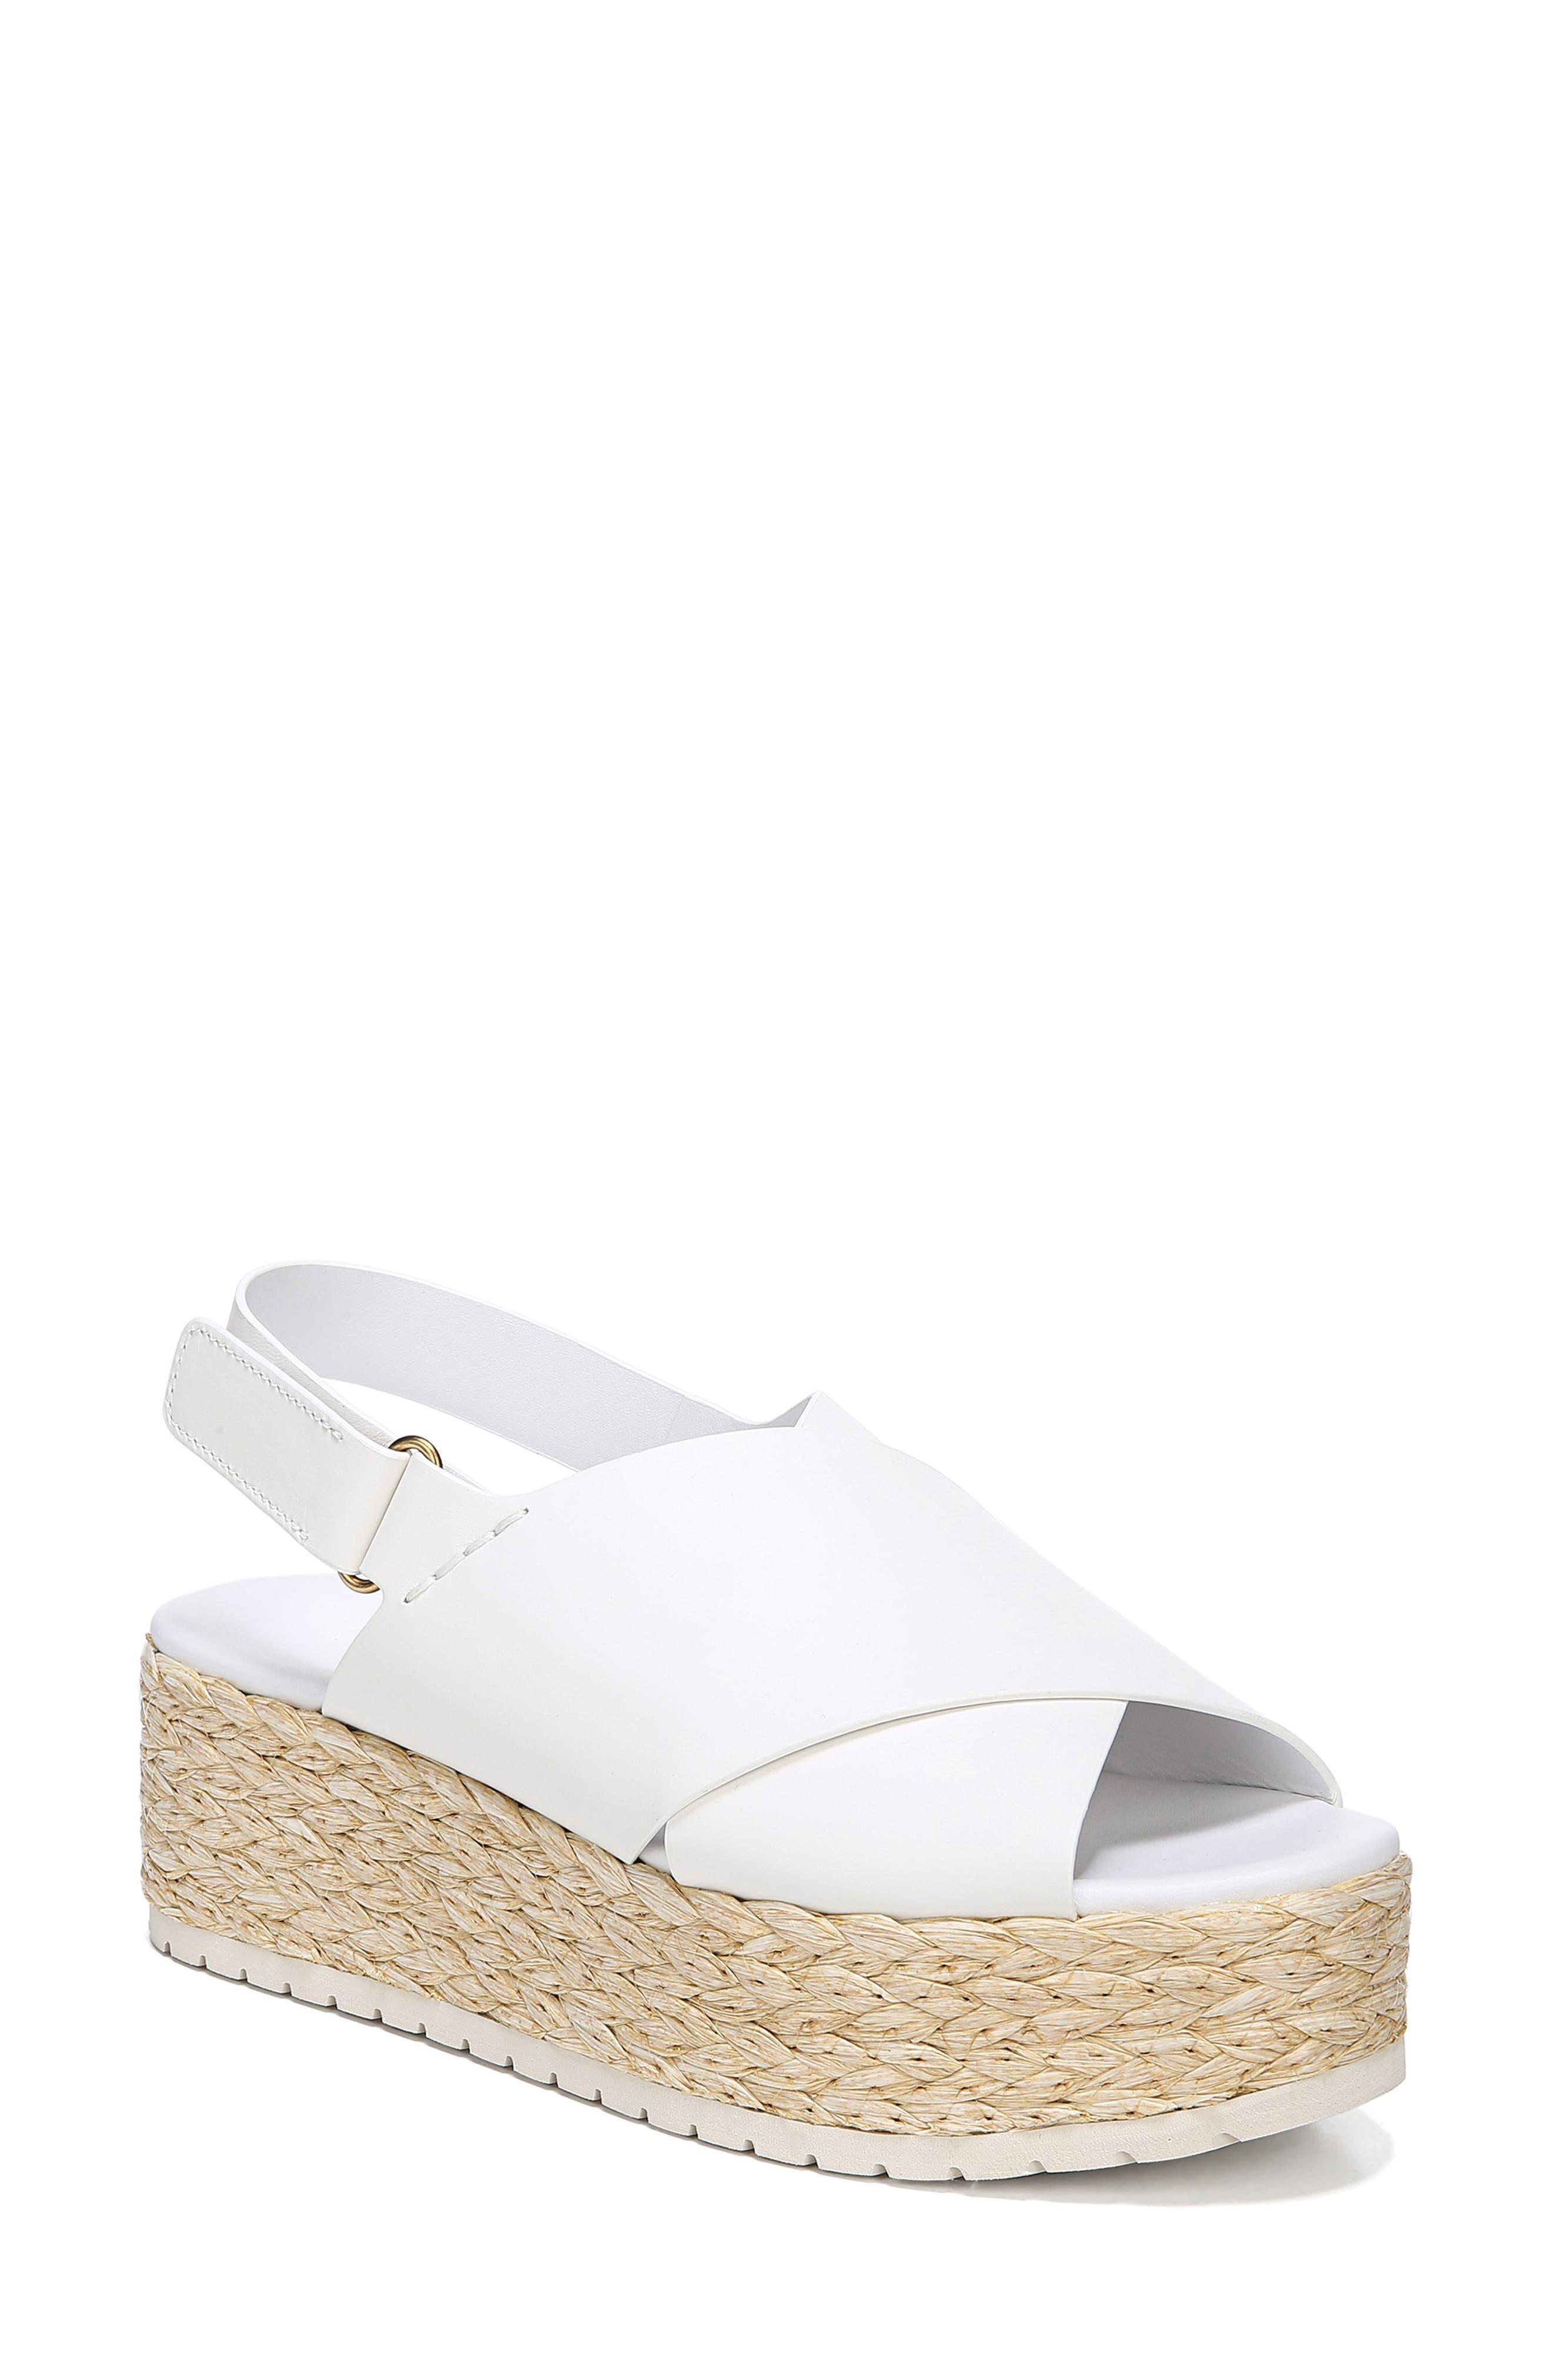 VINCE Jesson Espadrille Slingback Sandal, Main, color, OFF WHITE